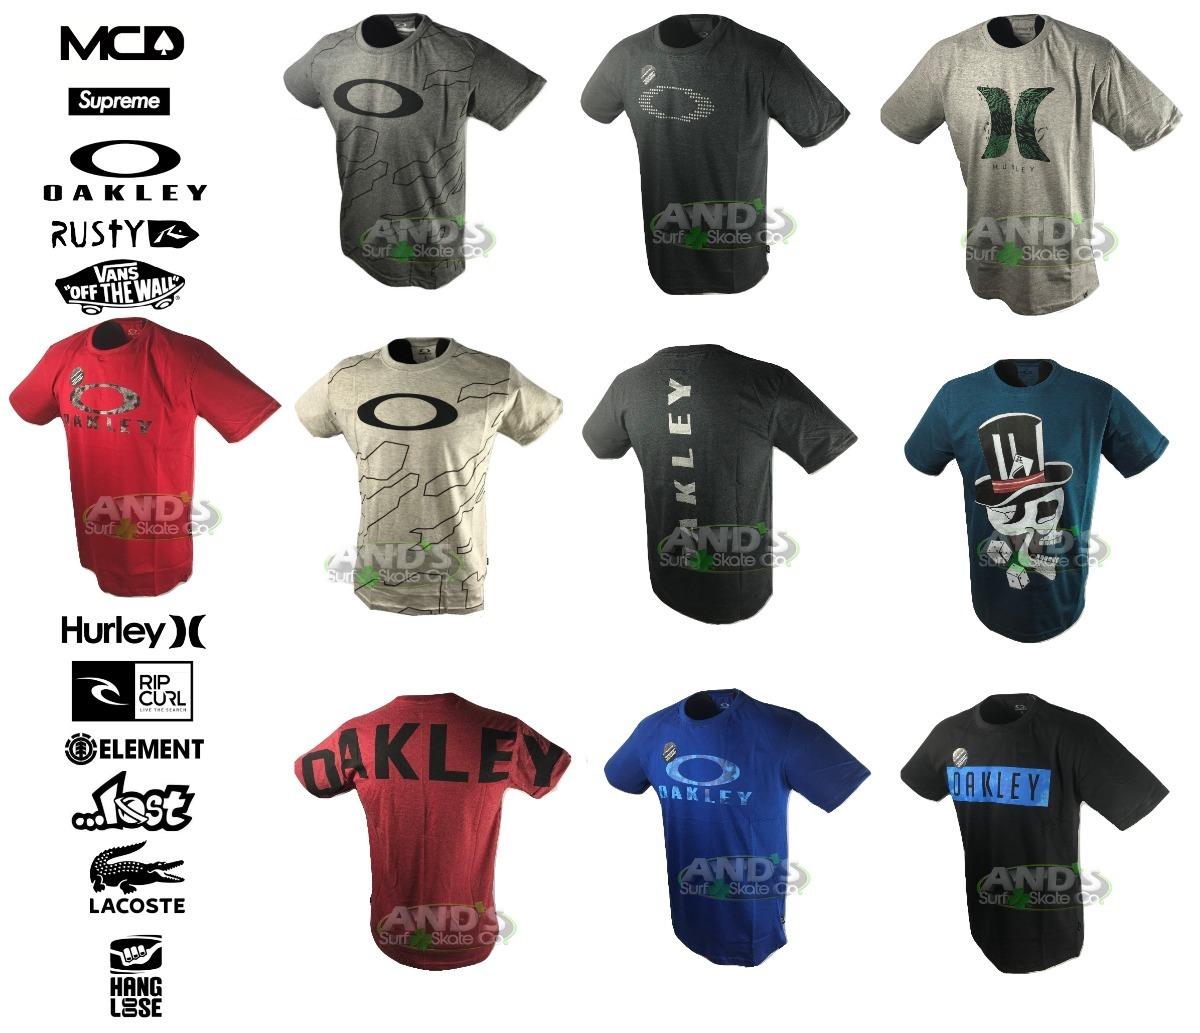 3e24610e6e kit 10 camisetas regatas oakley mcd oakley lost hurley. Carregando zoom.